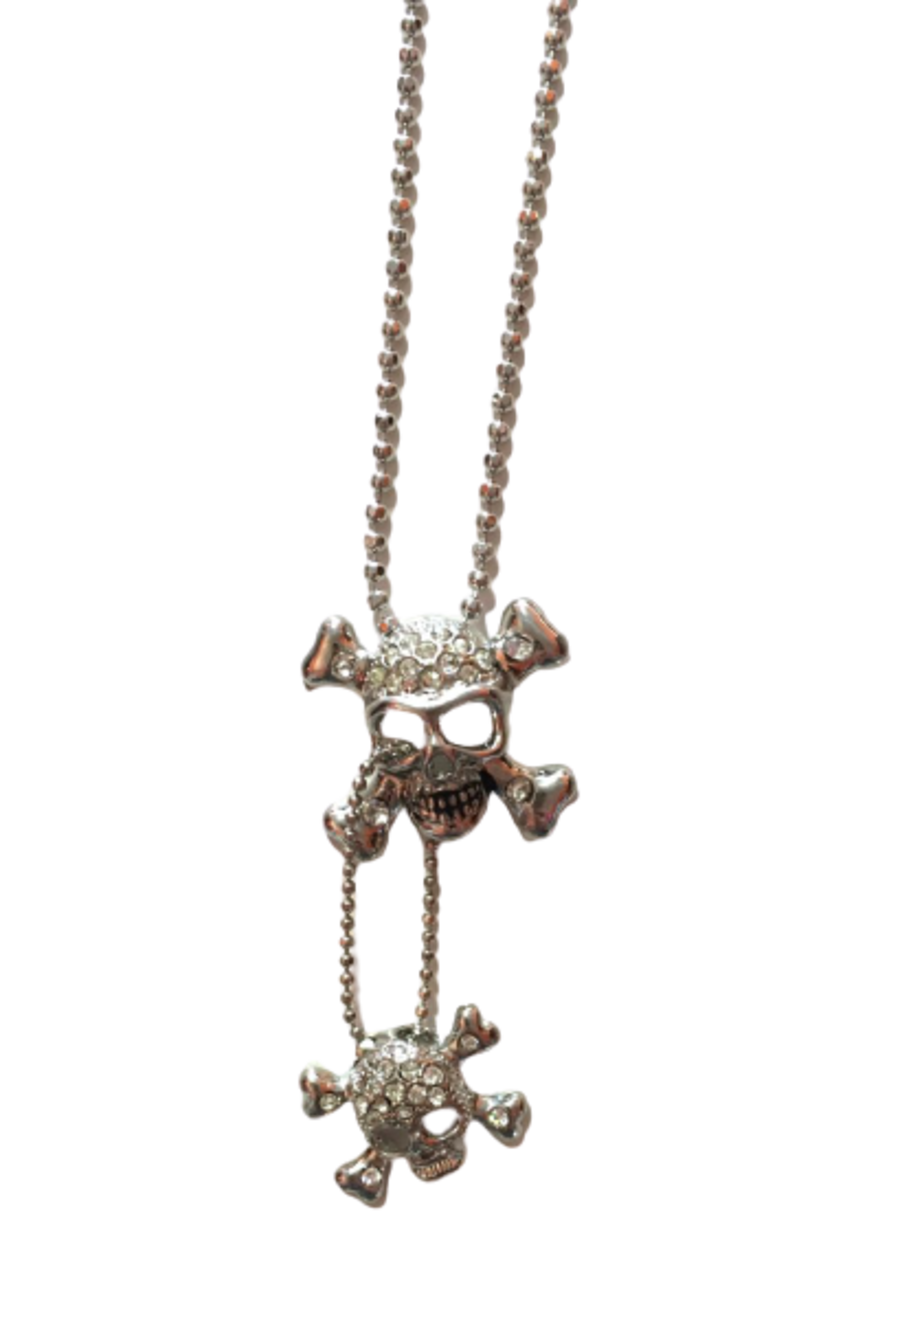 Double Skull & Bone Necklace